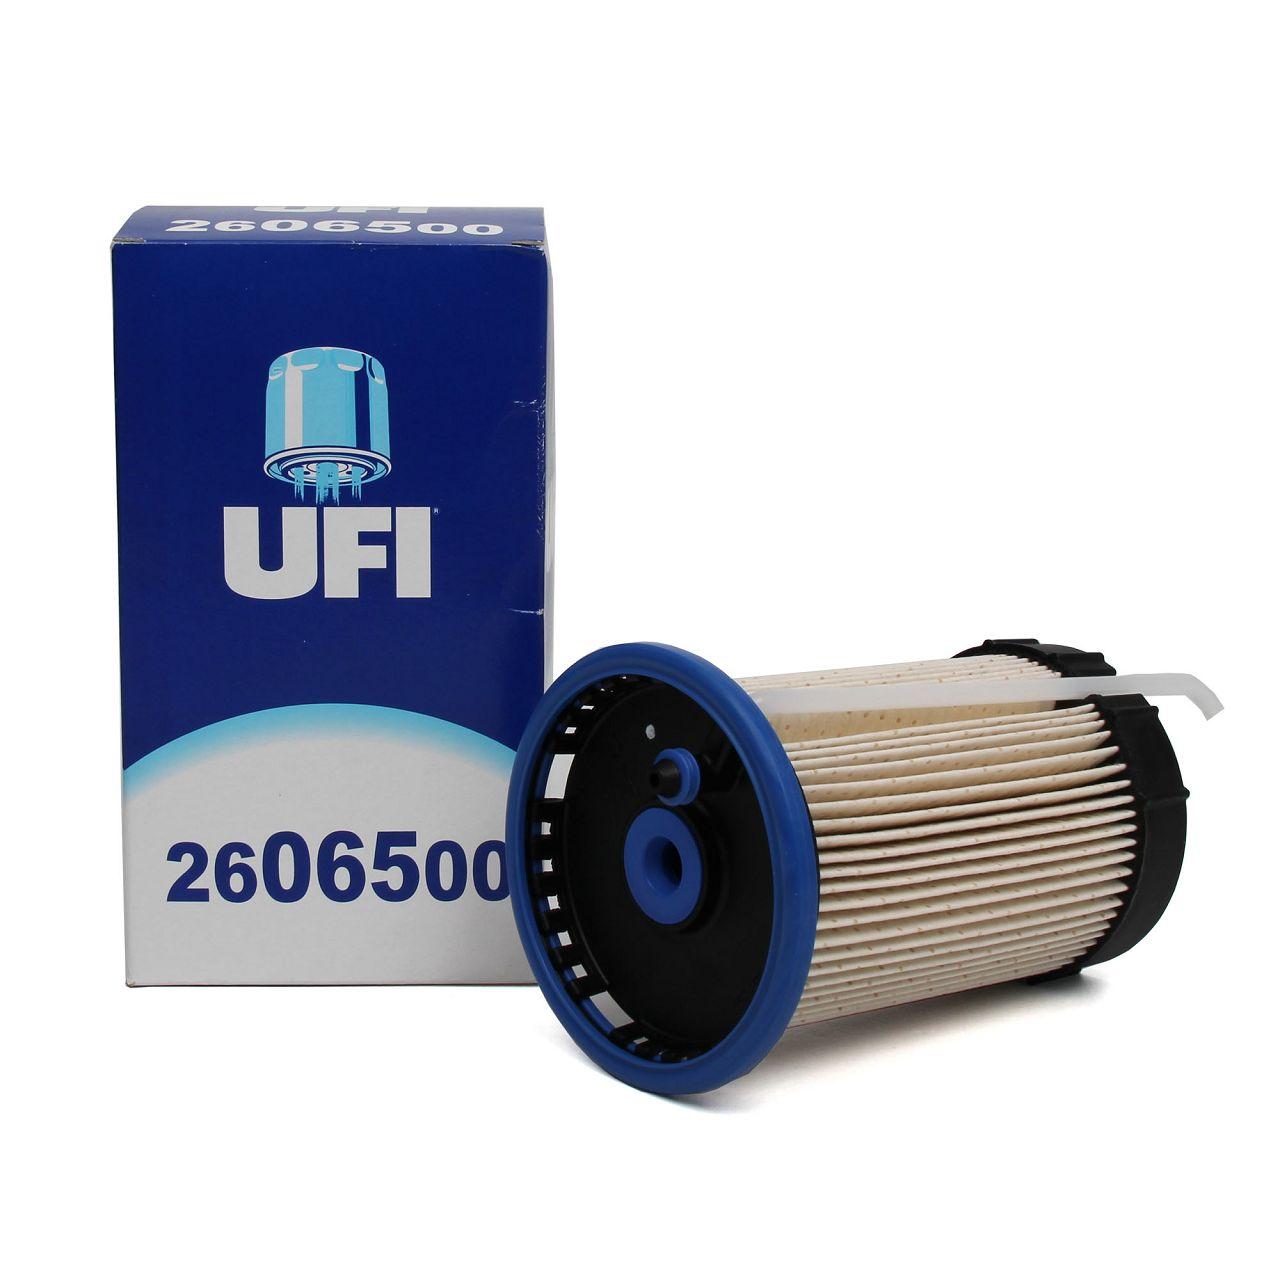 UFI Kraftstofffilter Dieselfilter 26.065.00 AUDI SEAT SKODA VW 1.6 TDI 2.0 TDI